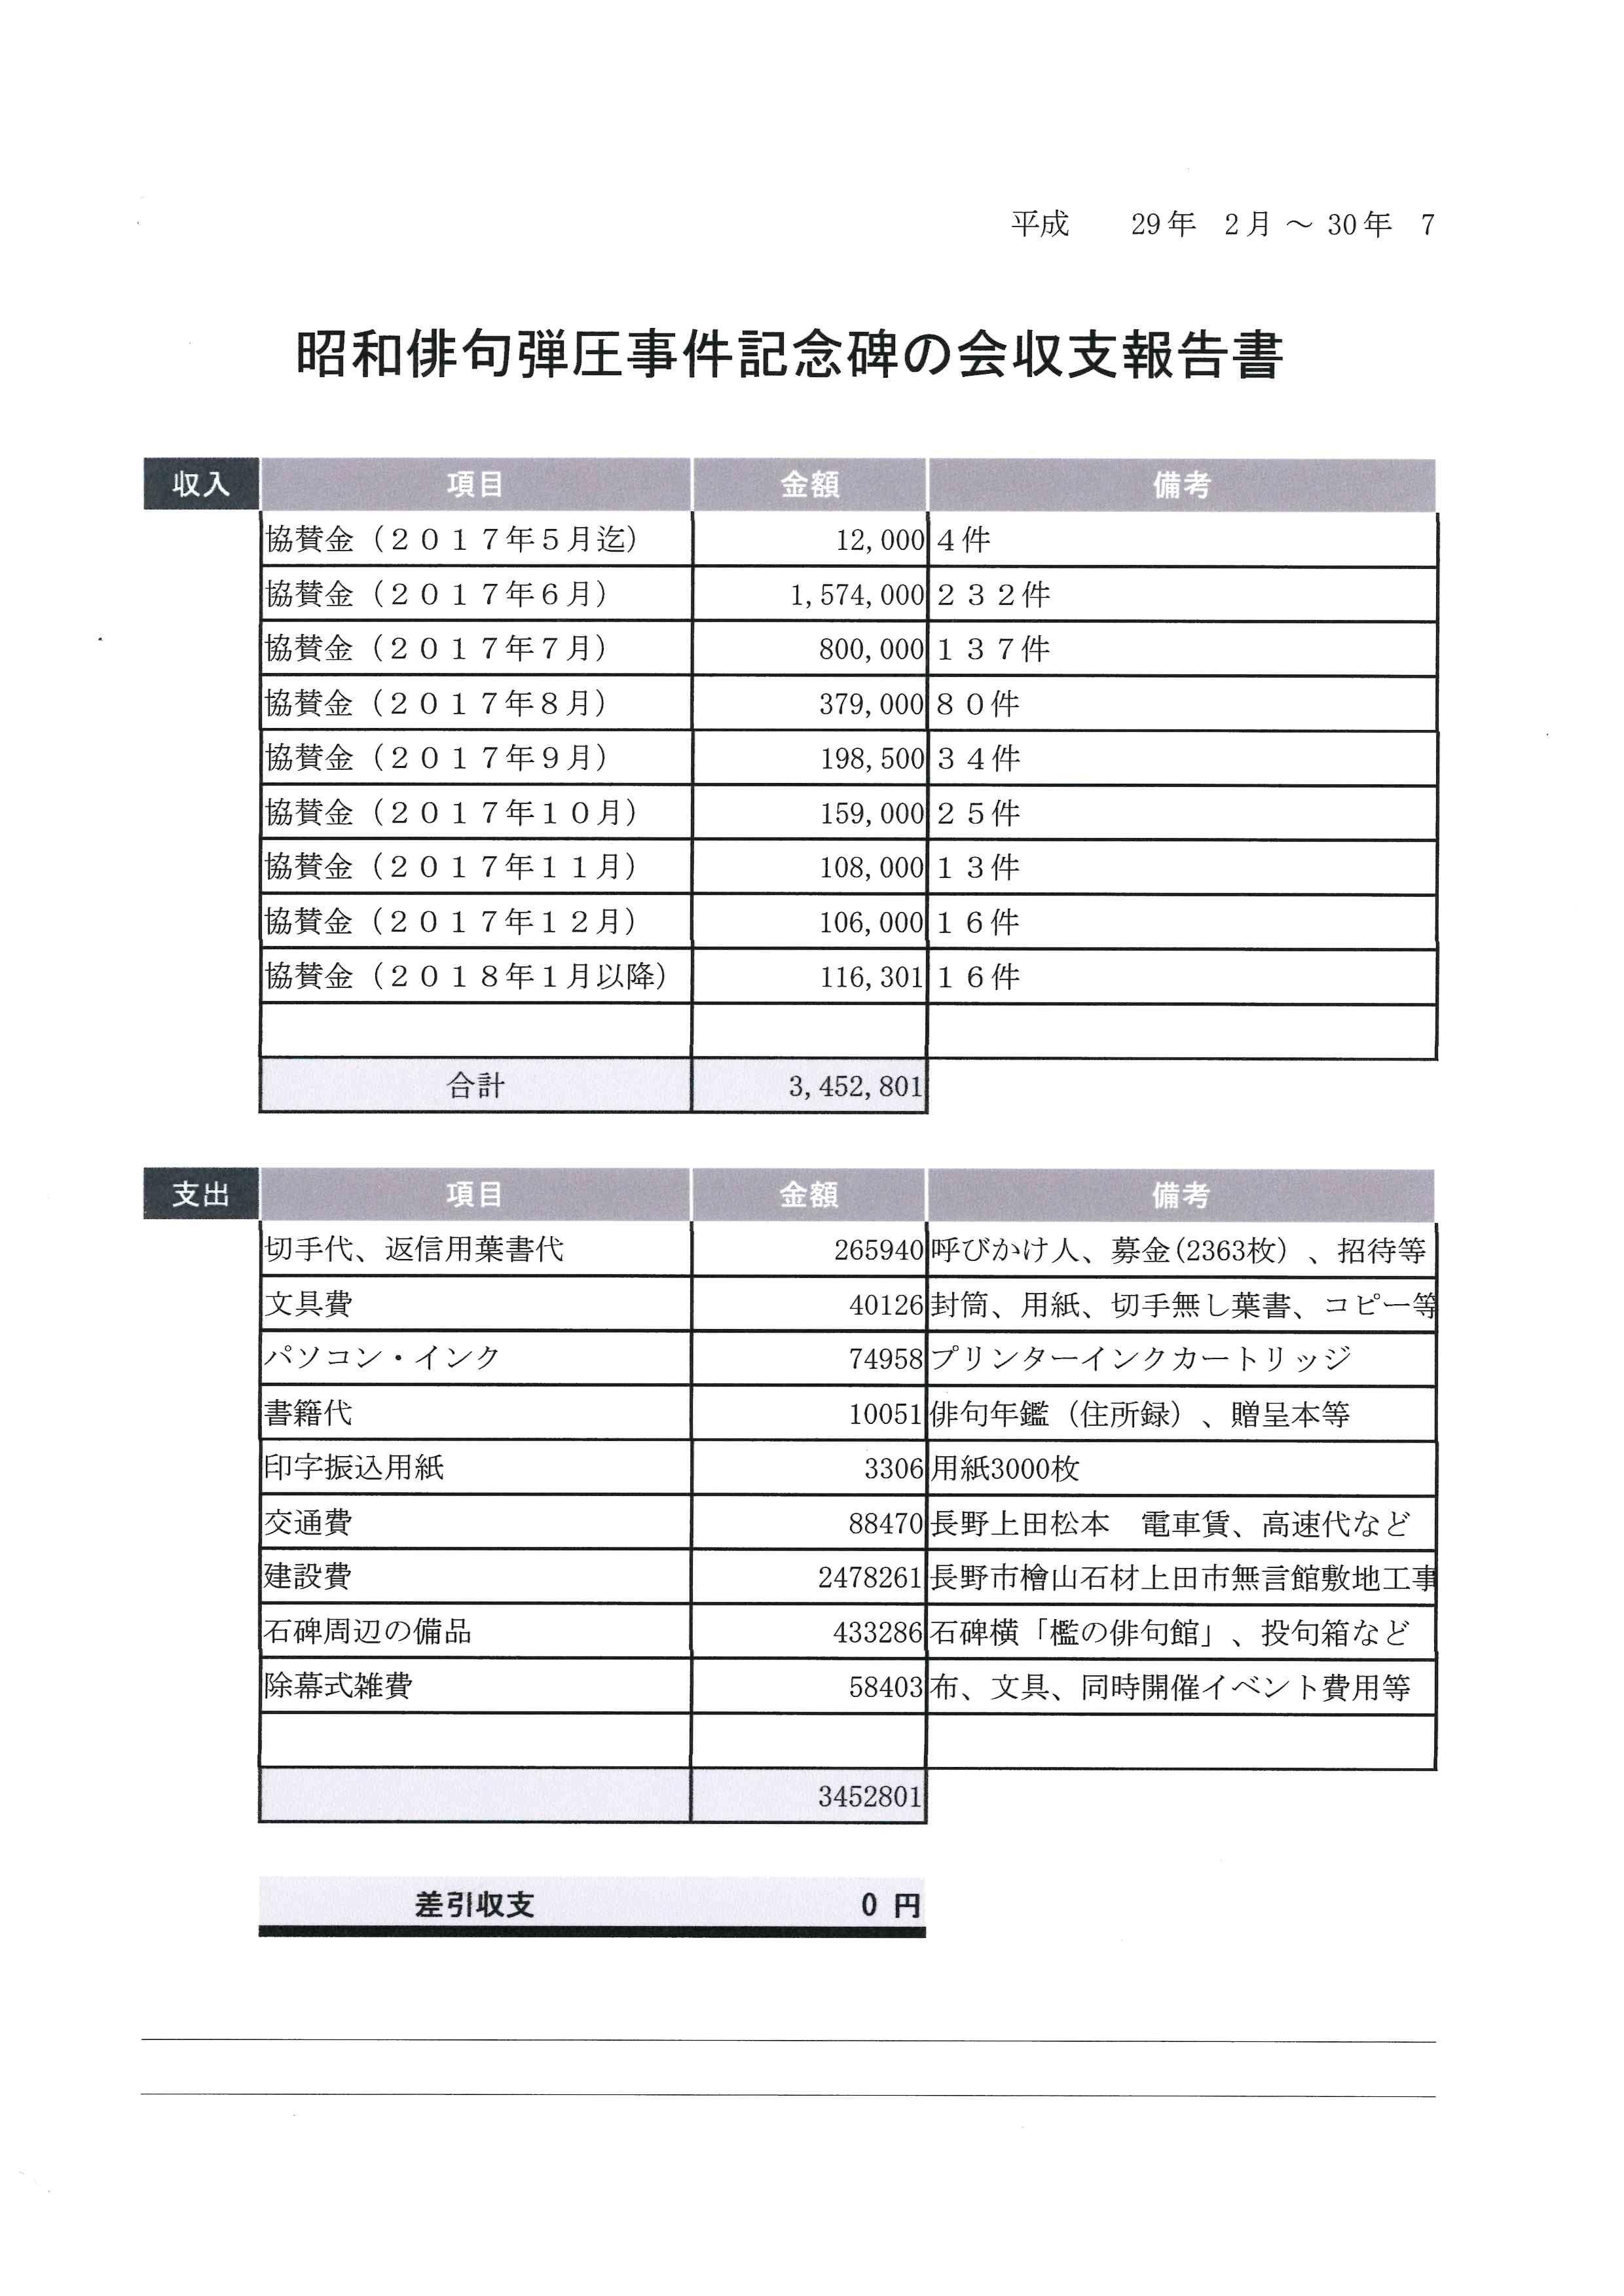 最終会計報告(2017年2月~2018年7月)と中間会計報告(2018年5、6、7月分) (Accounting report 2018/5,6,7 & final report)_e0375210_08242633.jpg